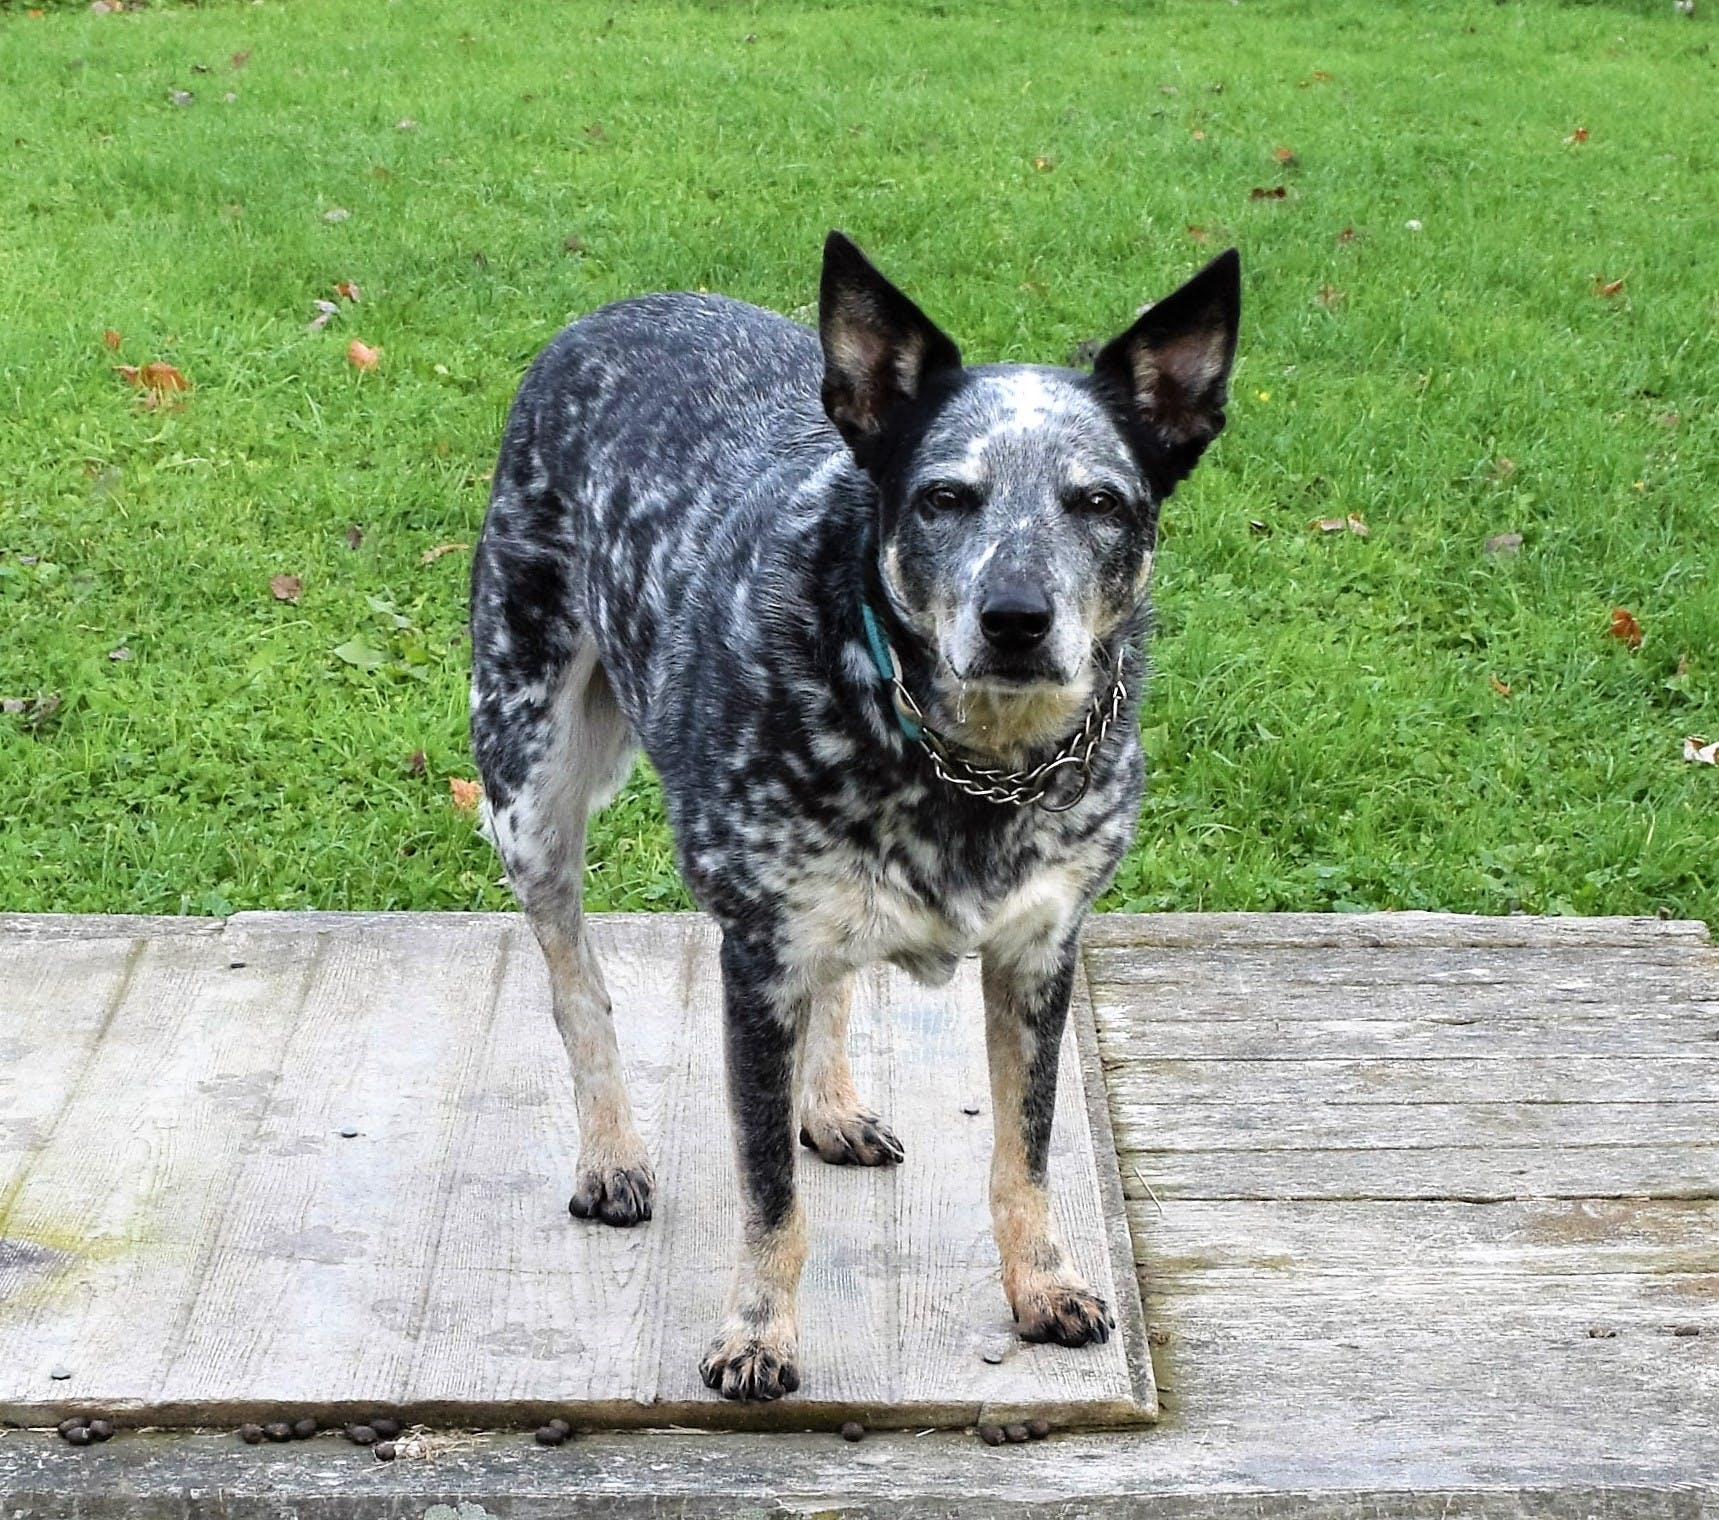 Free stock photo of Cattle dog